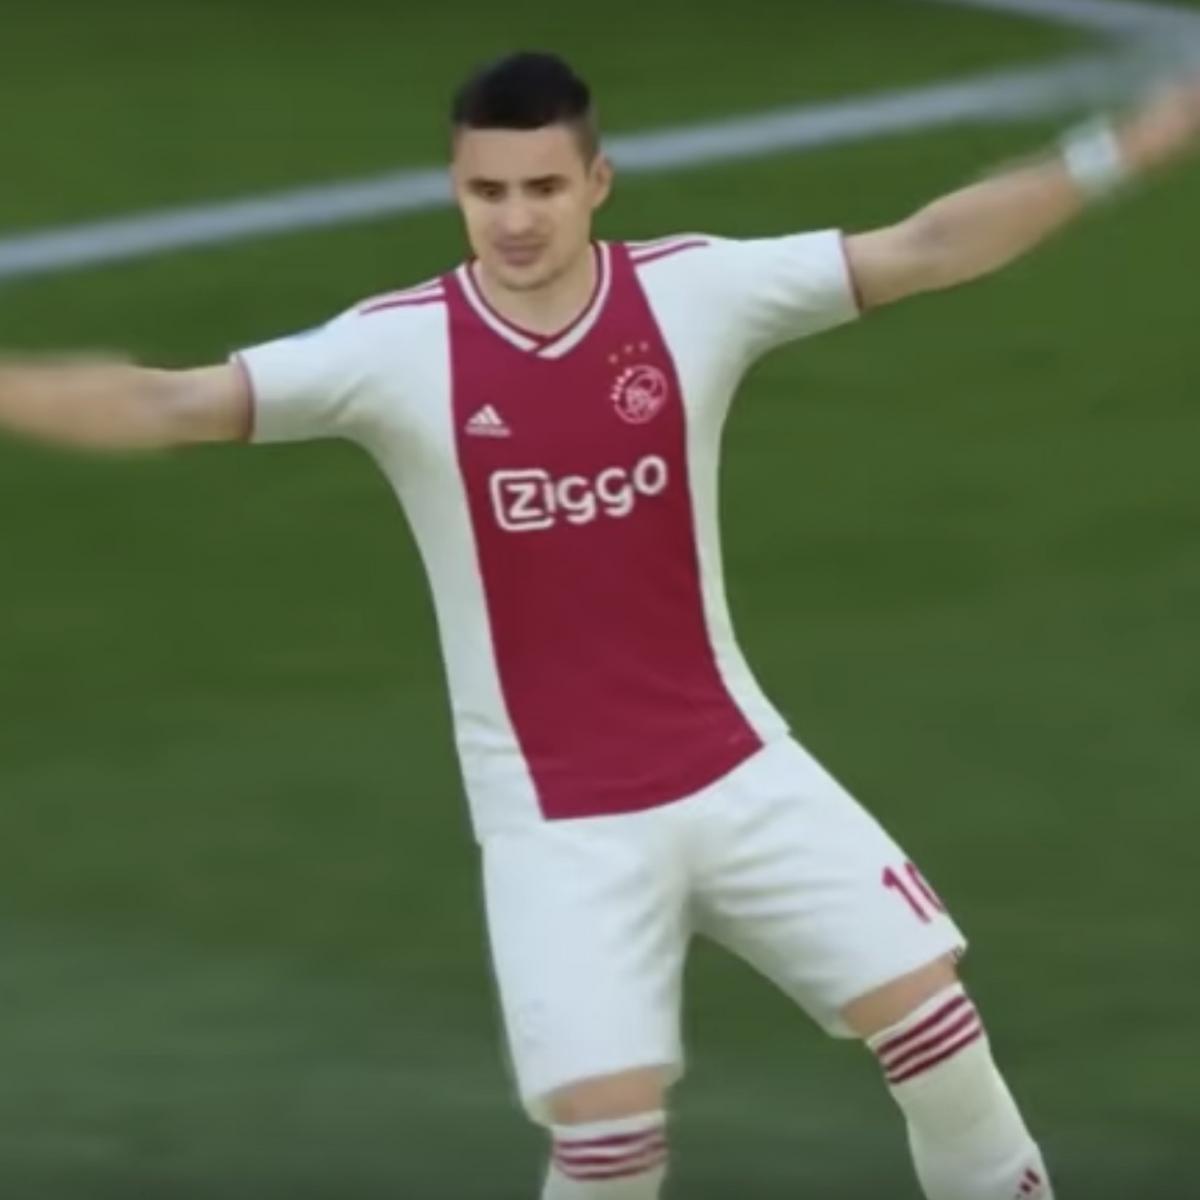 Tottenham Vs Ajax Highlights Football: FIFA 19 Tutorial: How To Get The Best Out Of Ajax